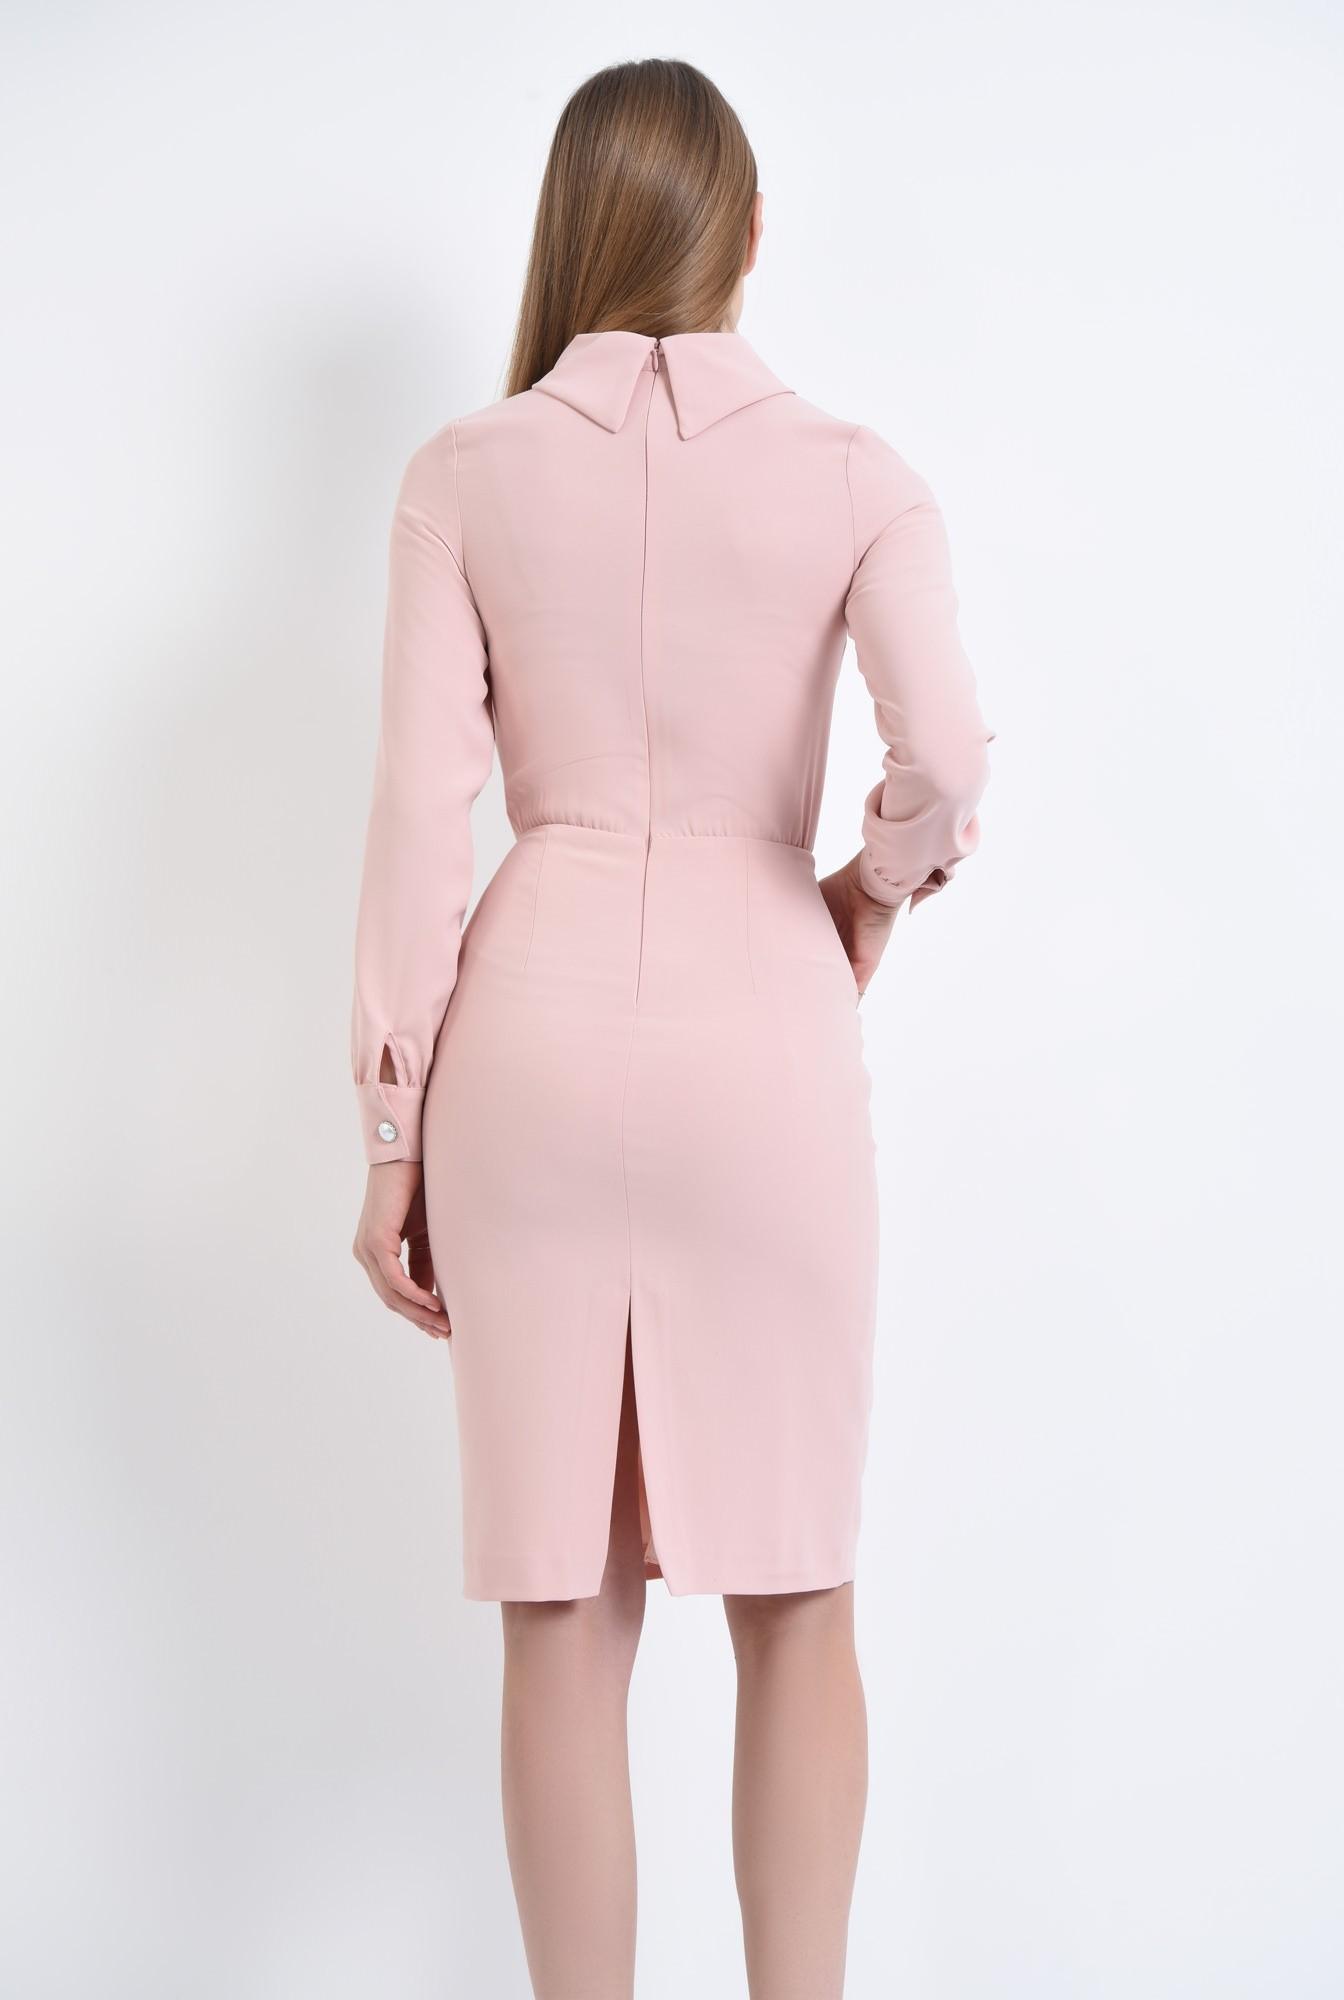 1 - Rochie casual, roz